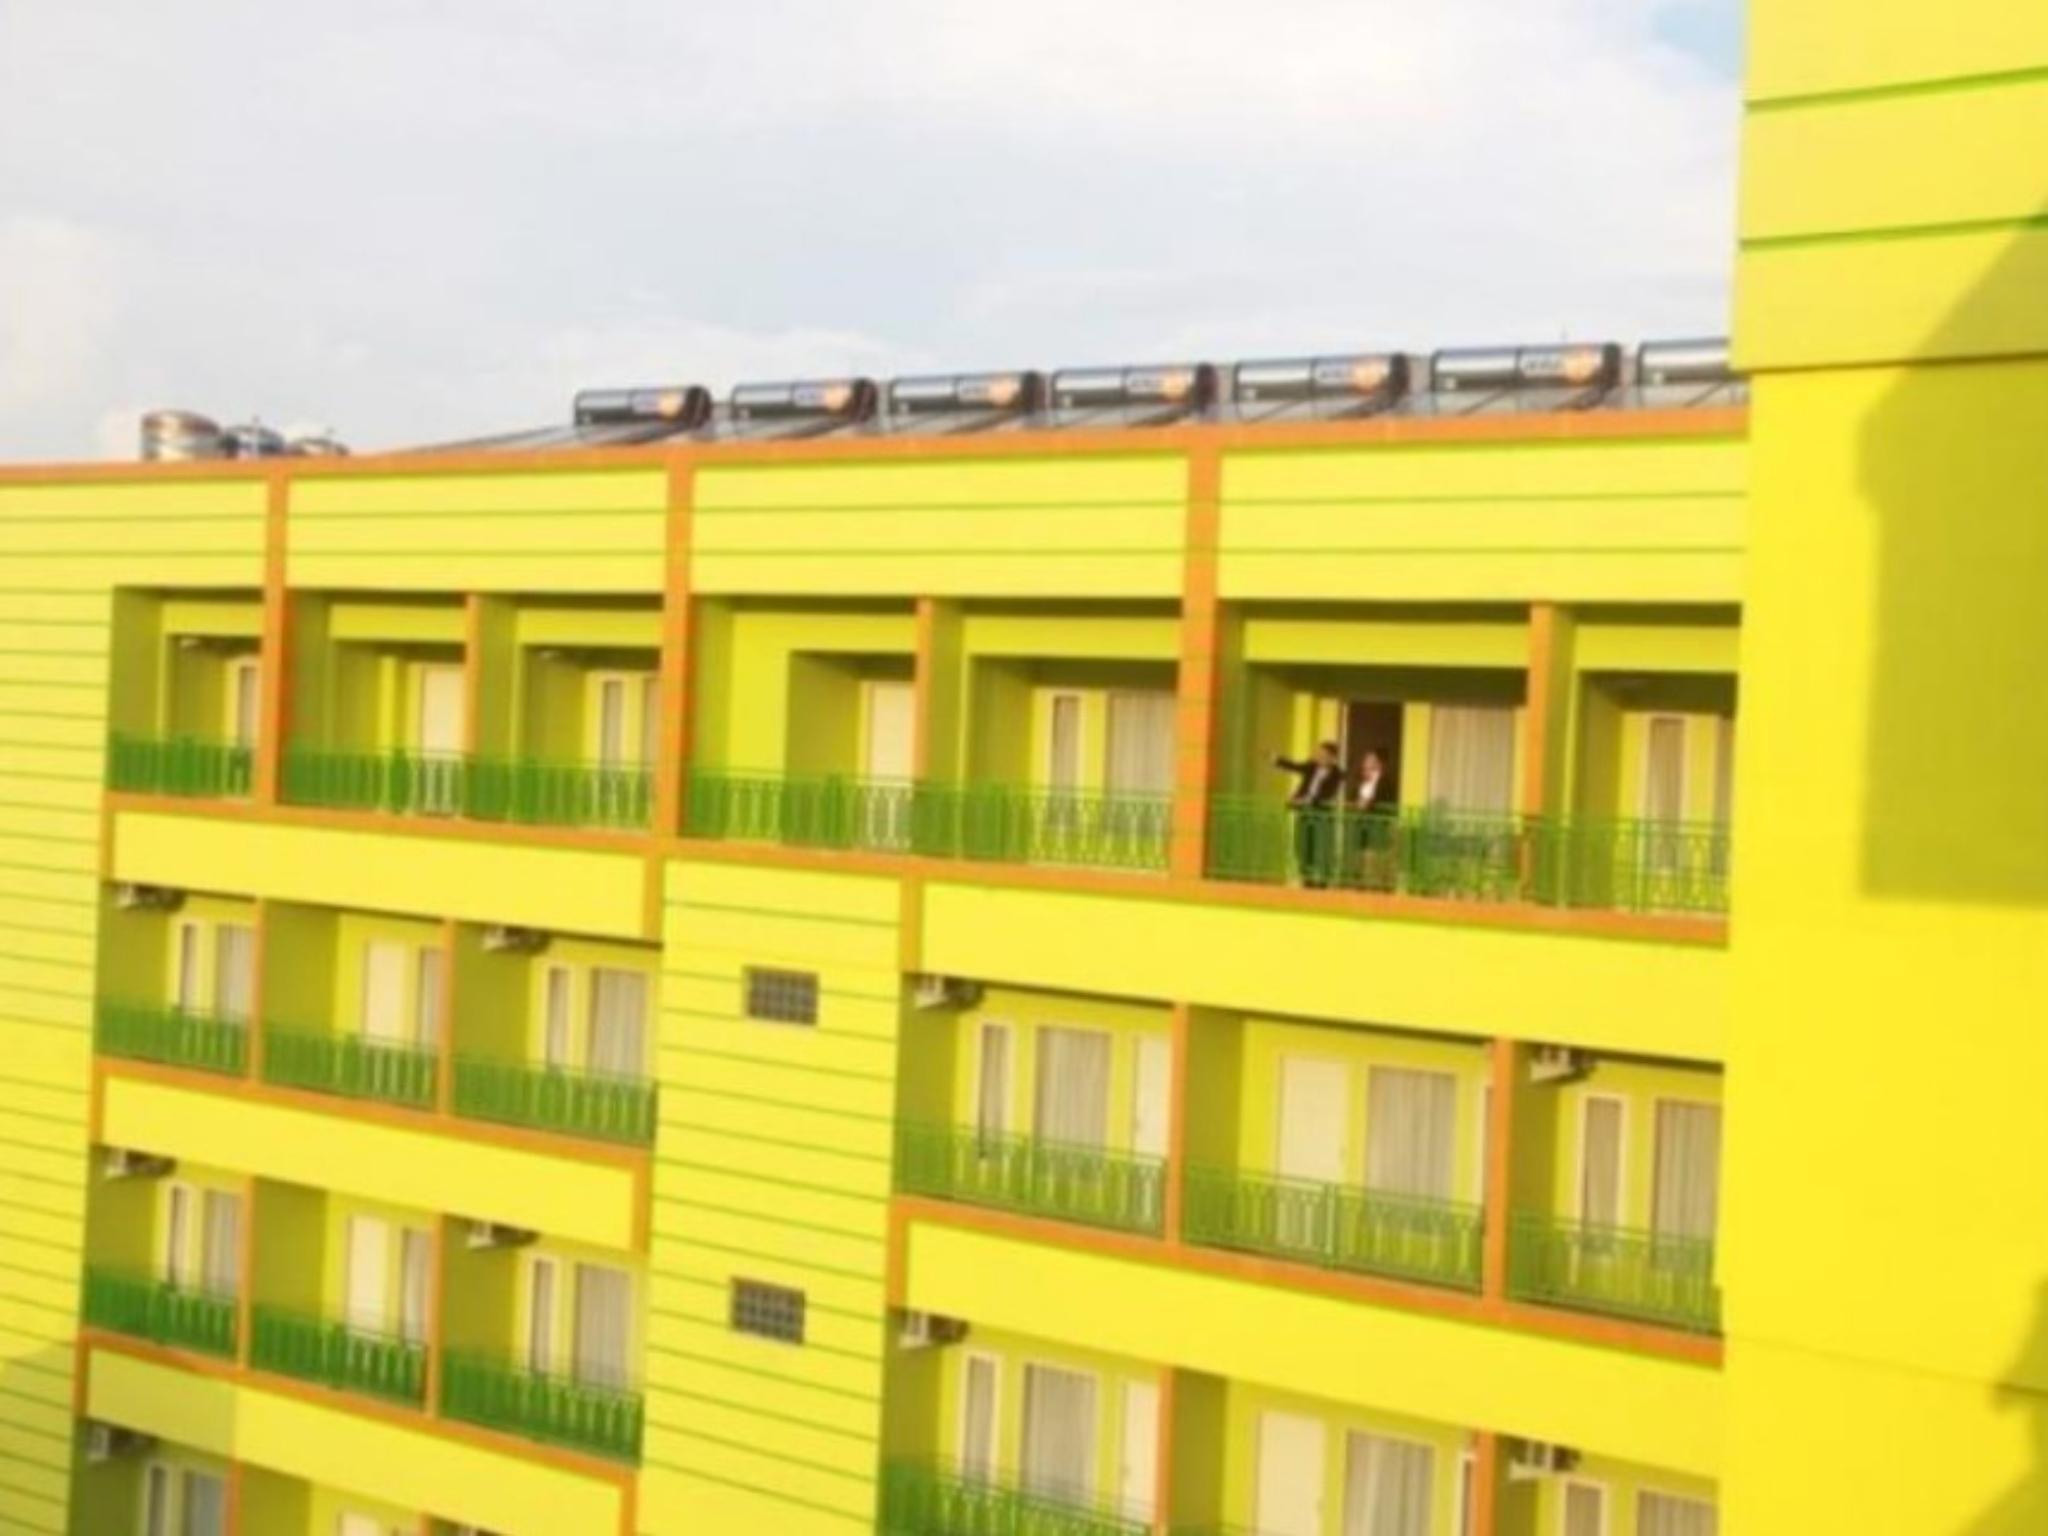 Hotel Muara Hotel and Mall Ternate - Jalan Merdeka no 19 Ternate - Maluku Utara 97724 - Ternate